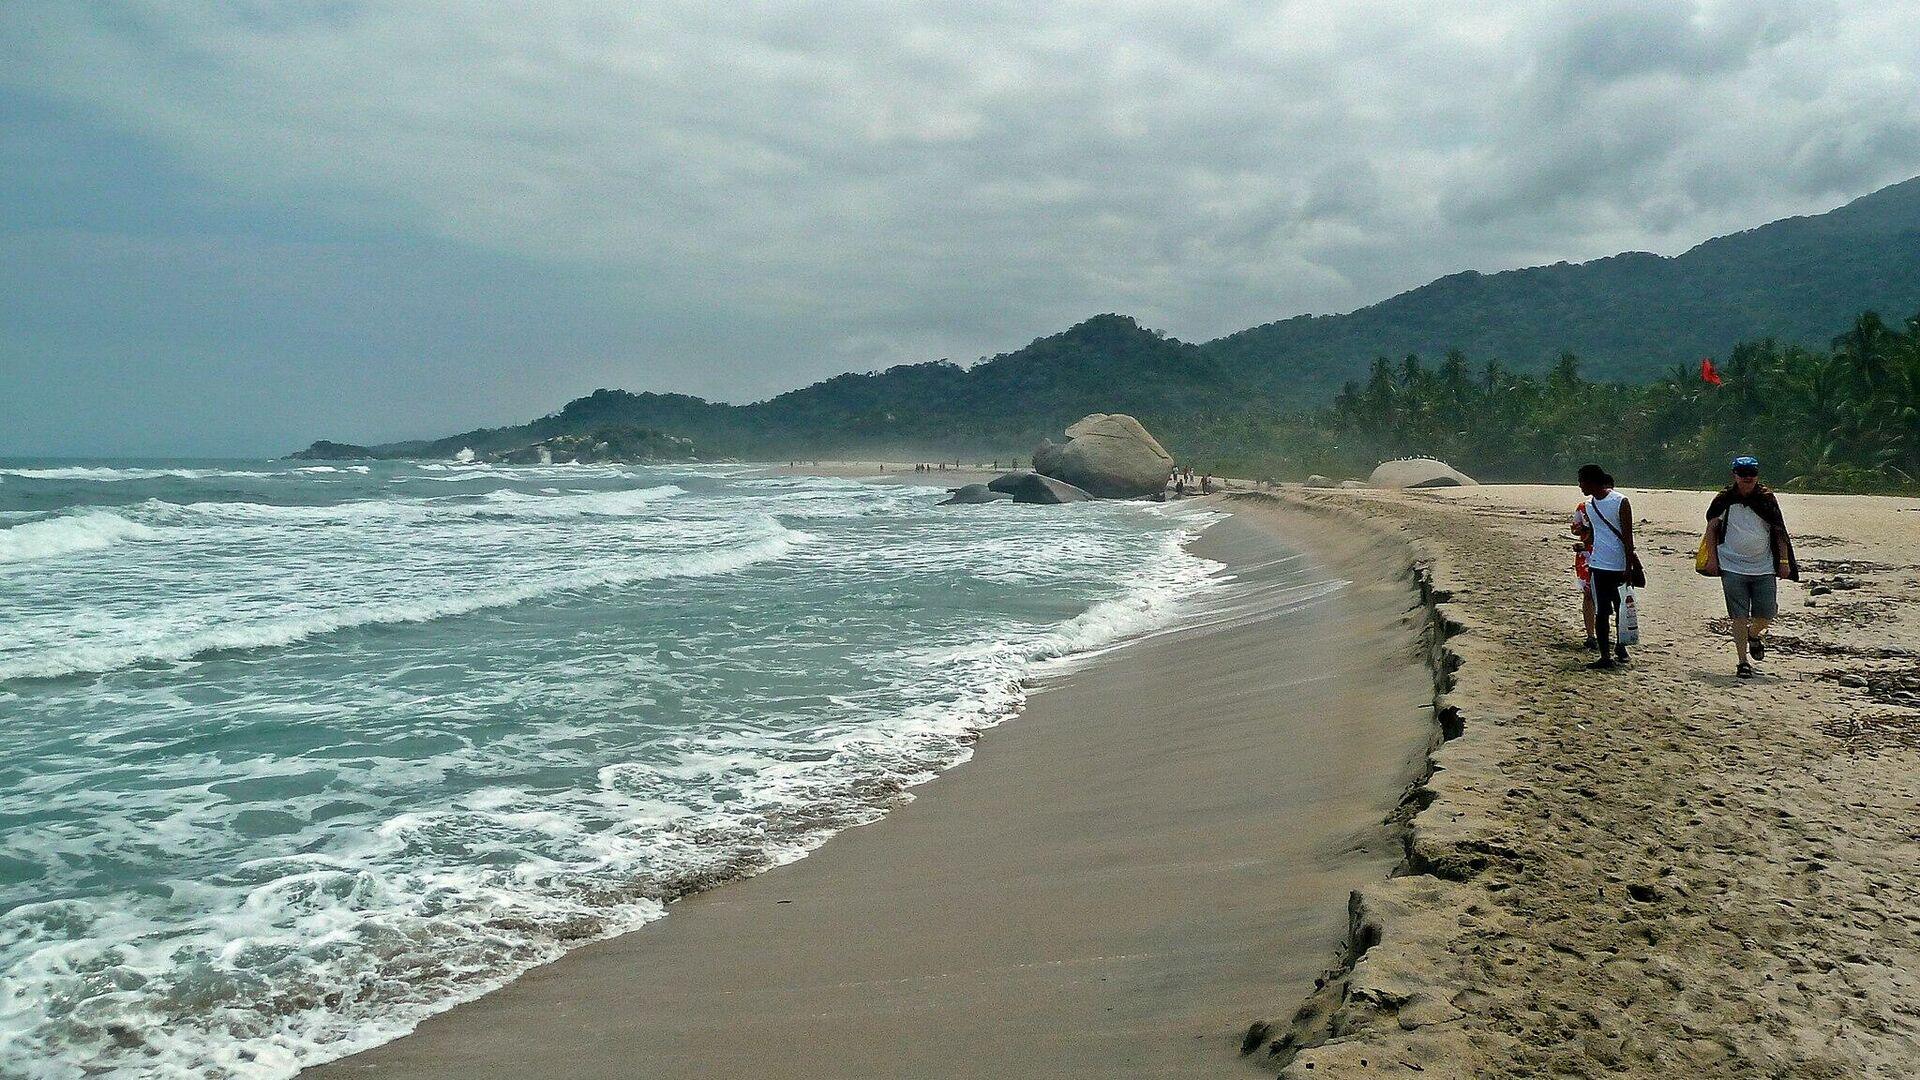 Playa Arrecife, Tayrona, Colombia - Sputnik Mundo, 1920, 11.03.2021